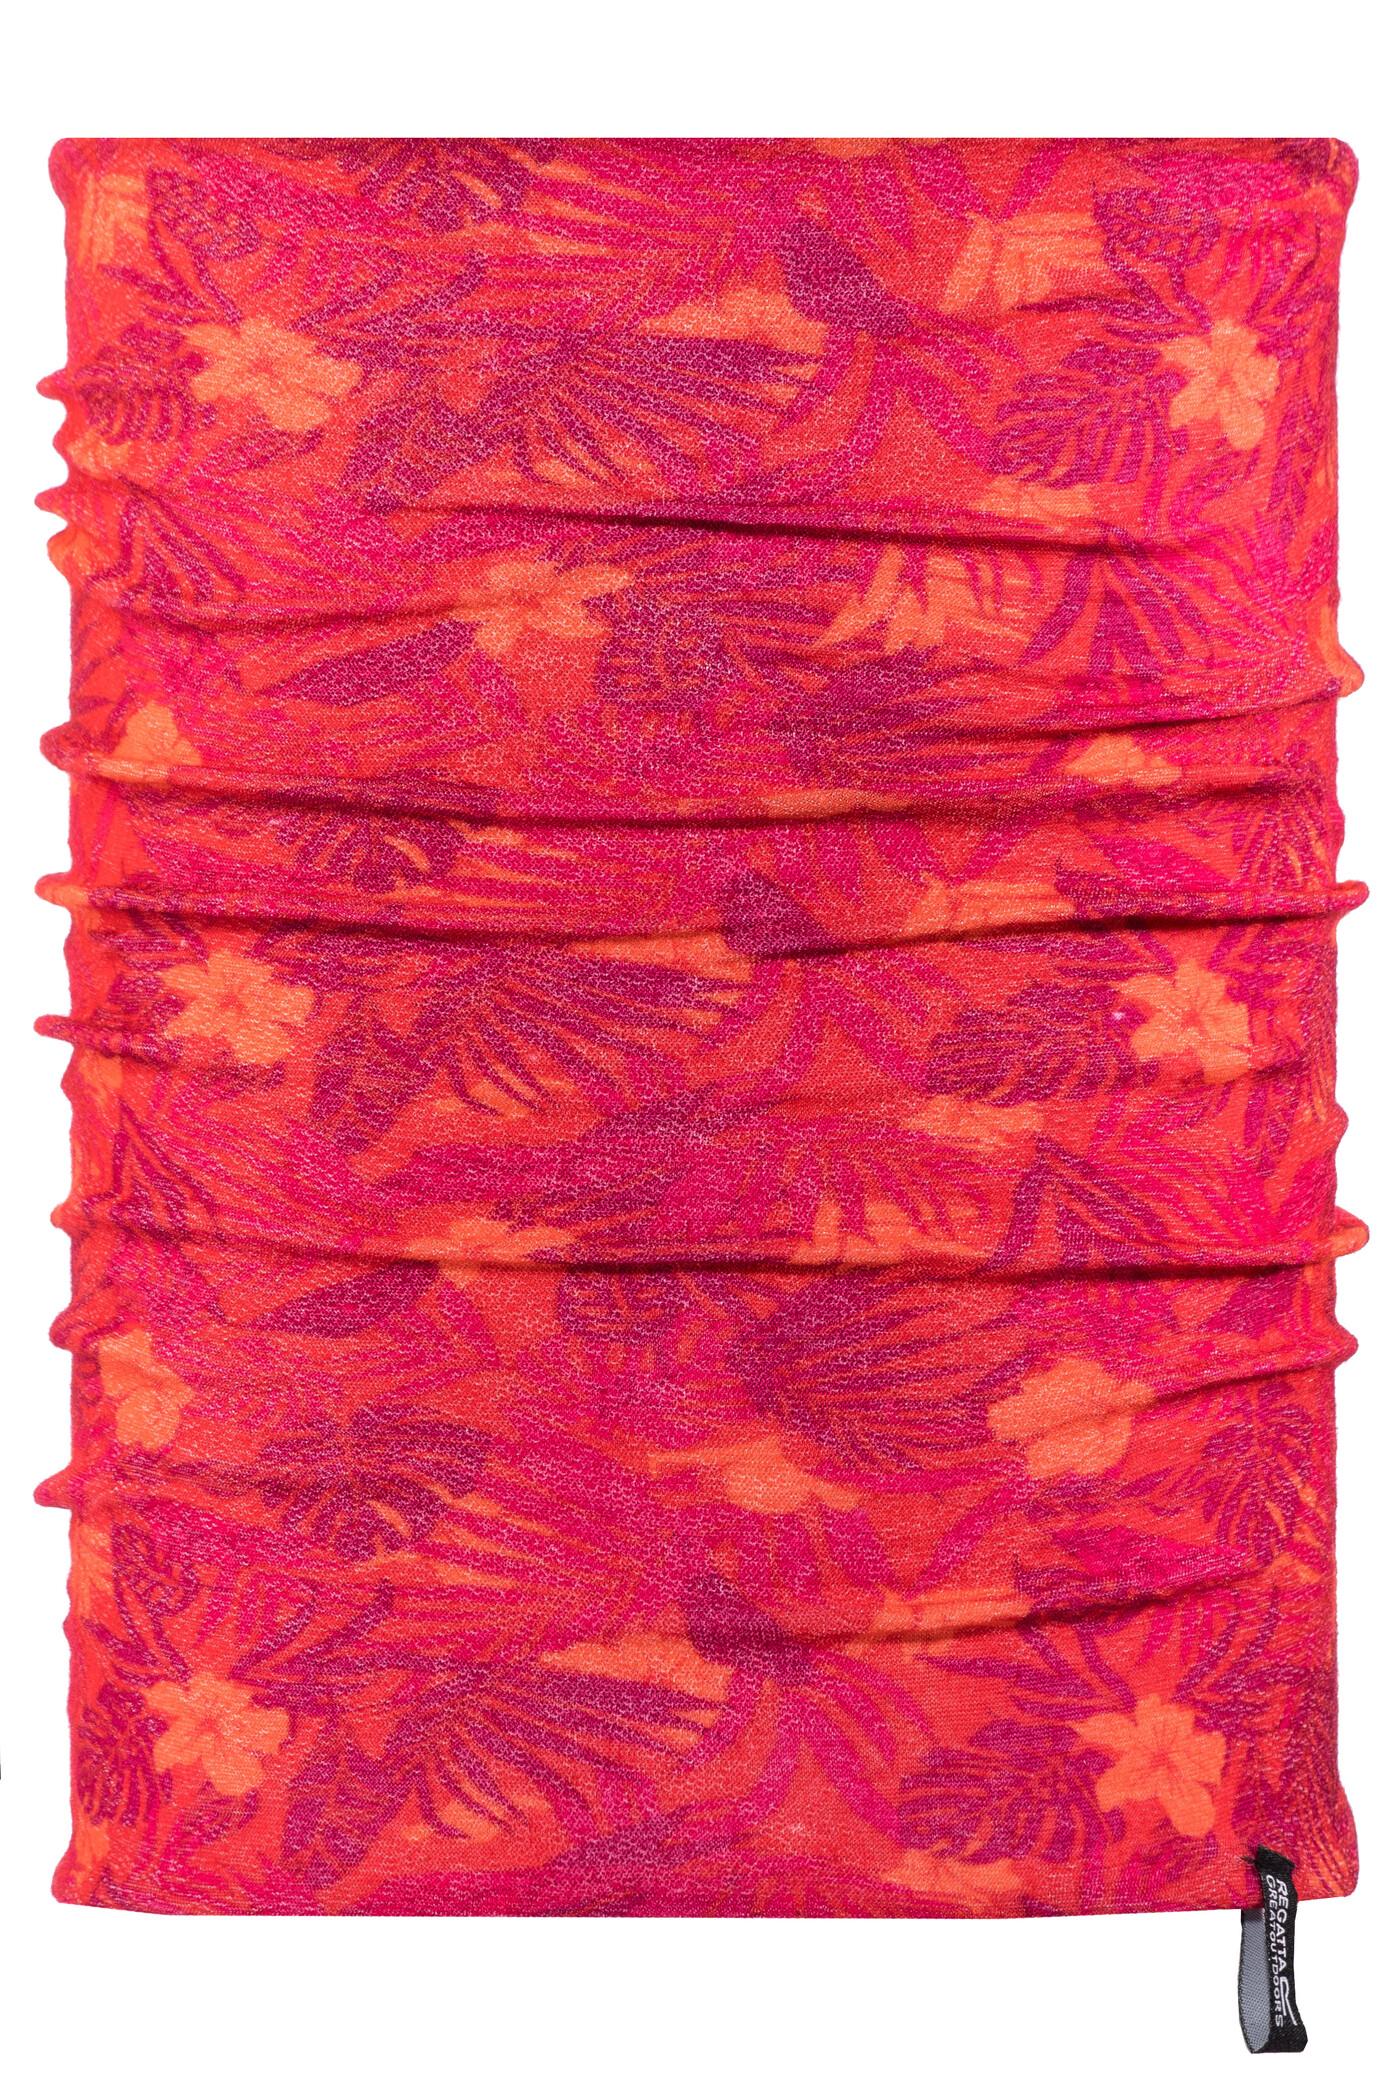 Regatta Print Multitube Børn, coral blush | Hovedbeklædning